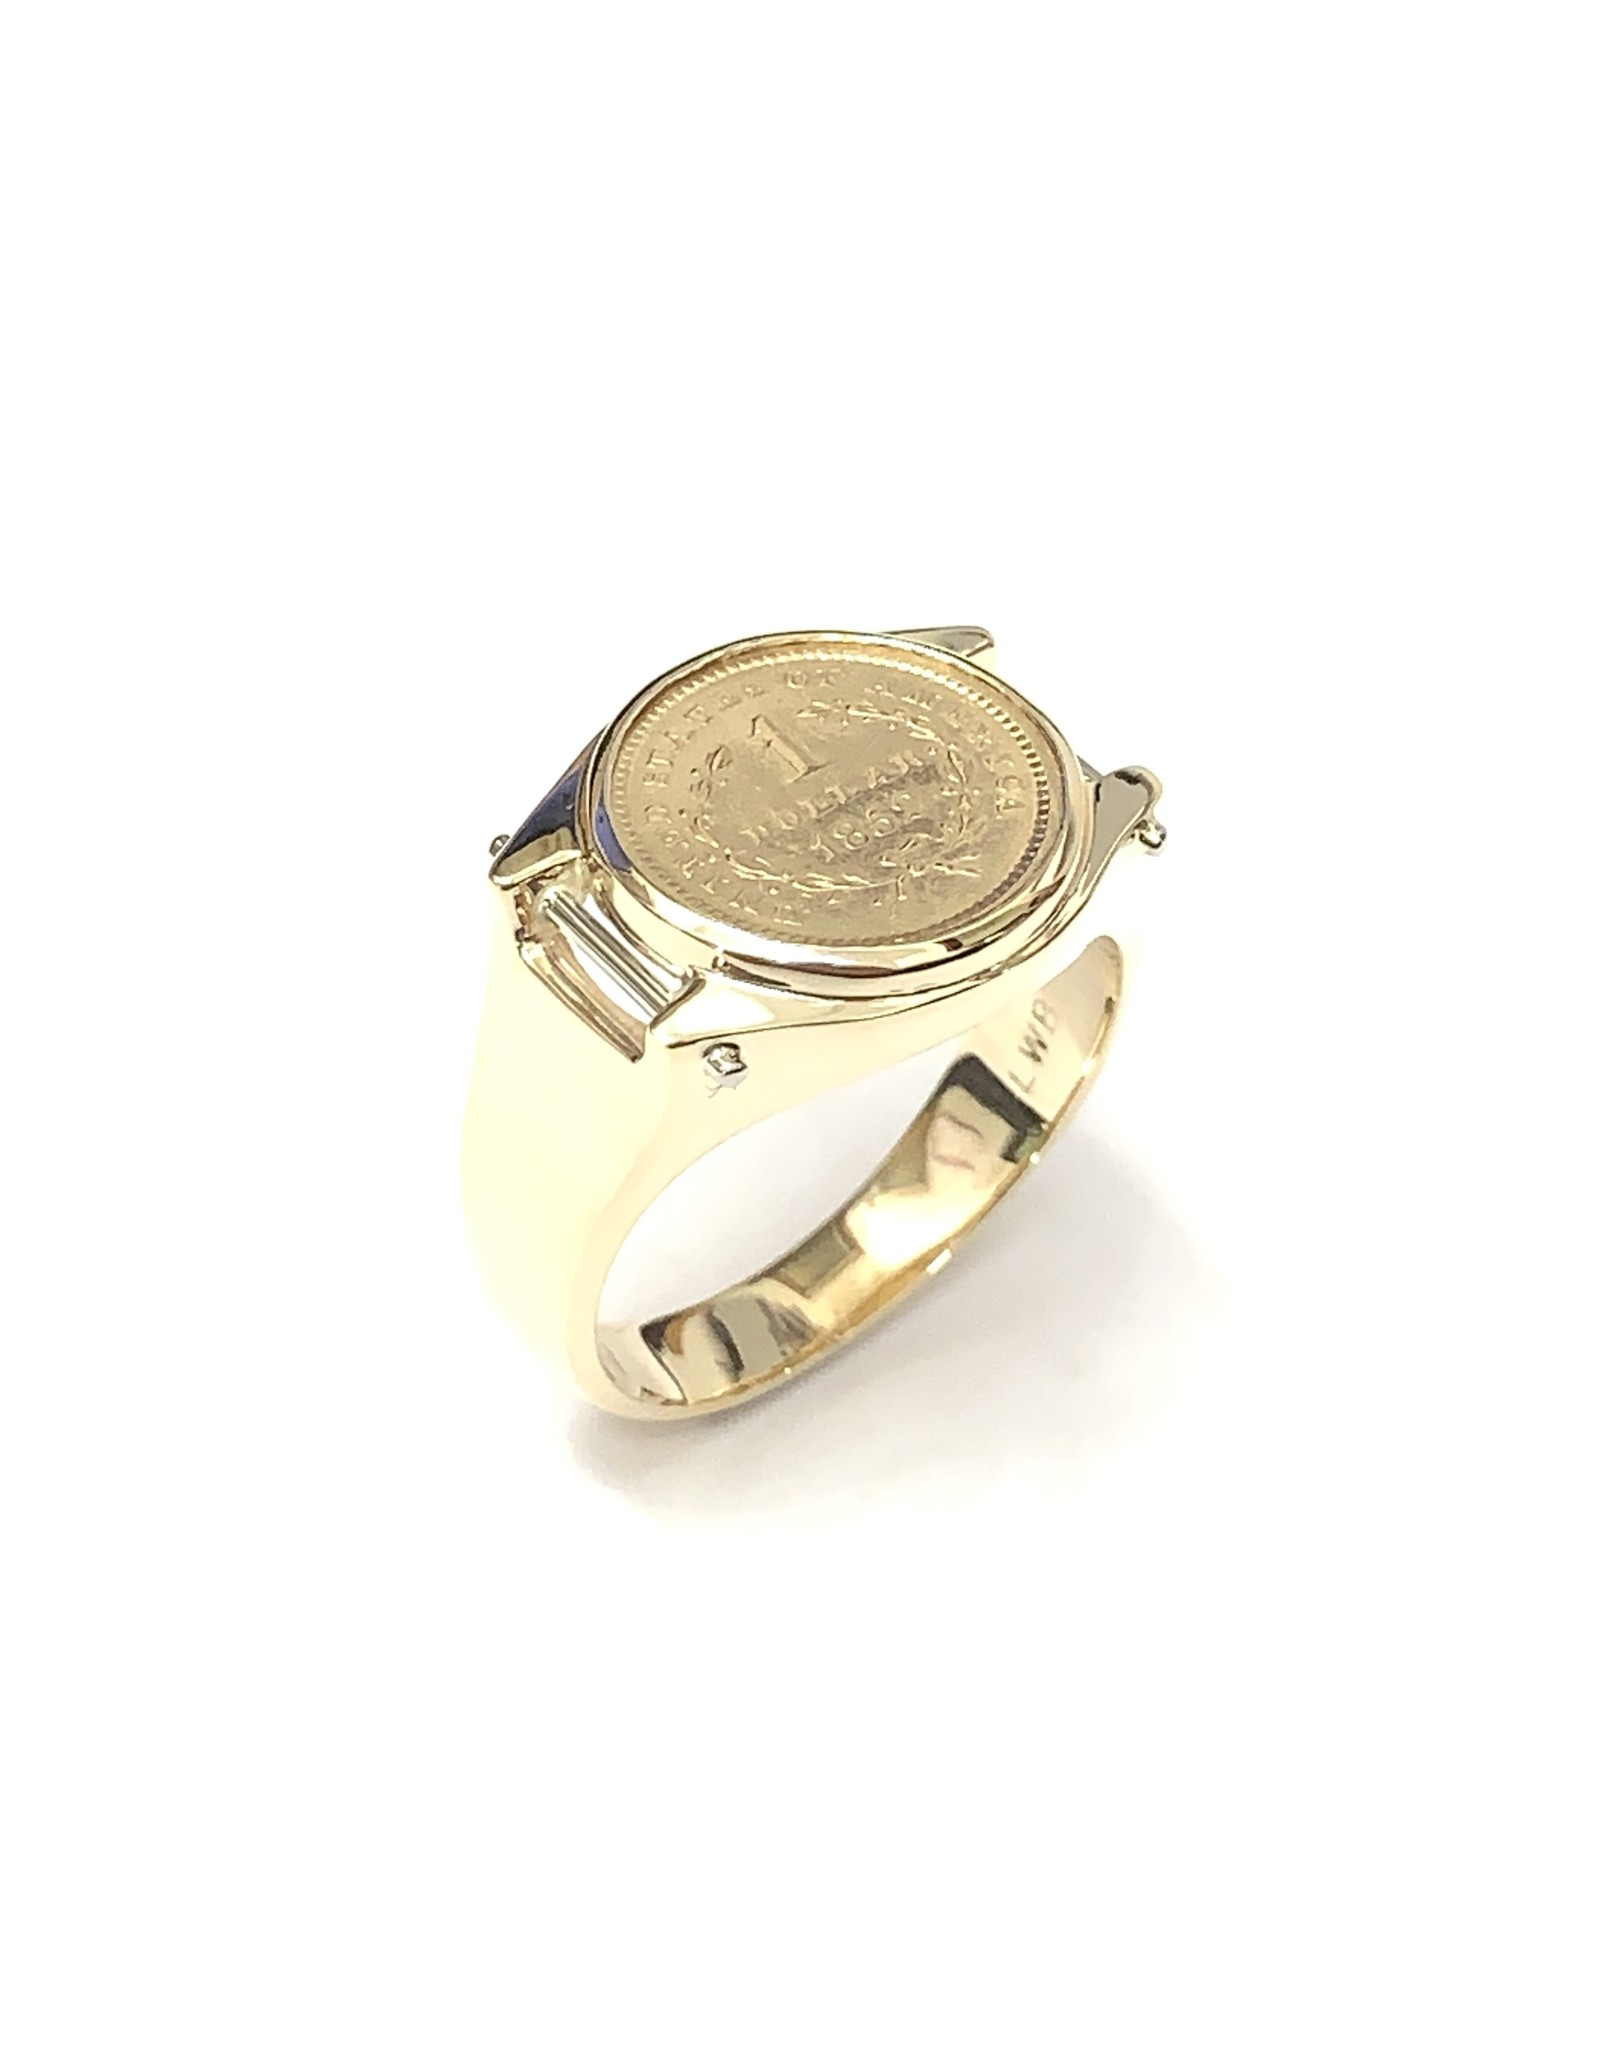 1852 United States 1 Dollar Ring 10KY